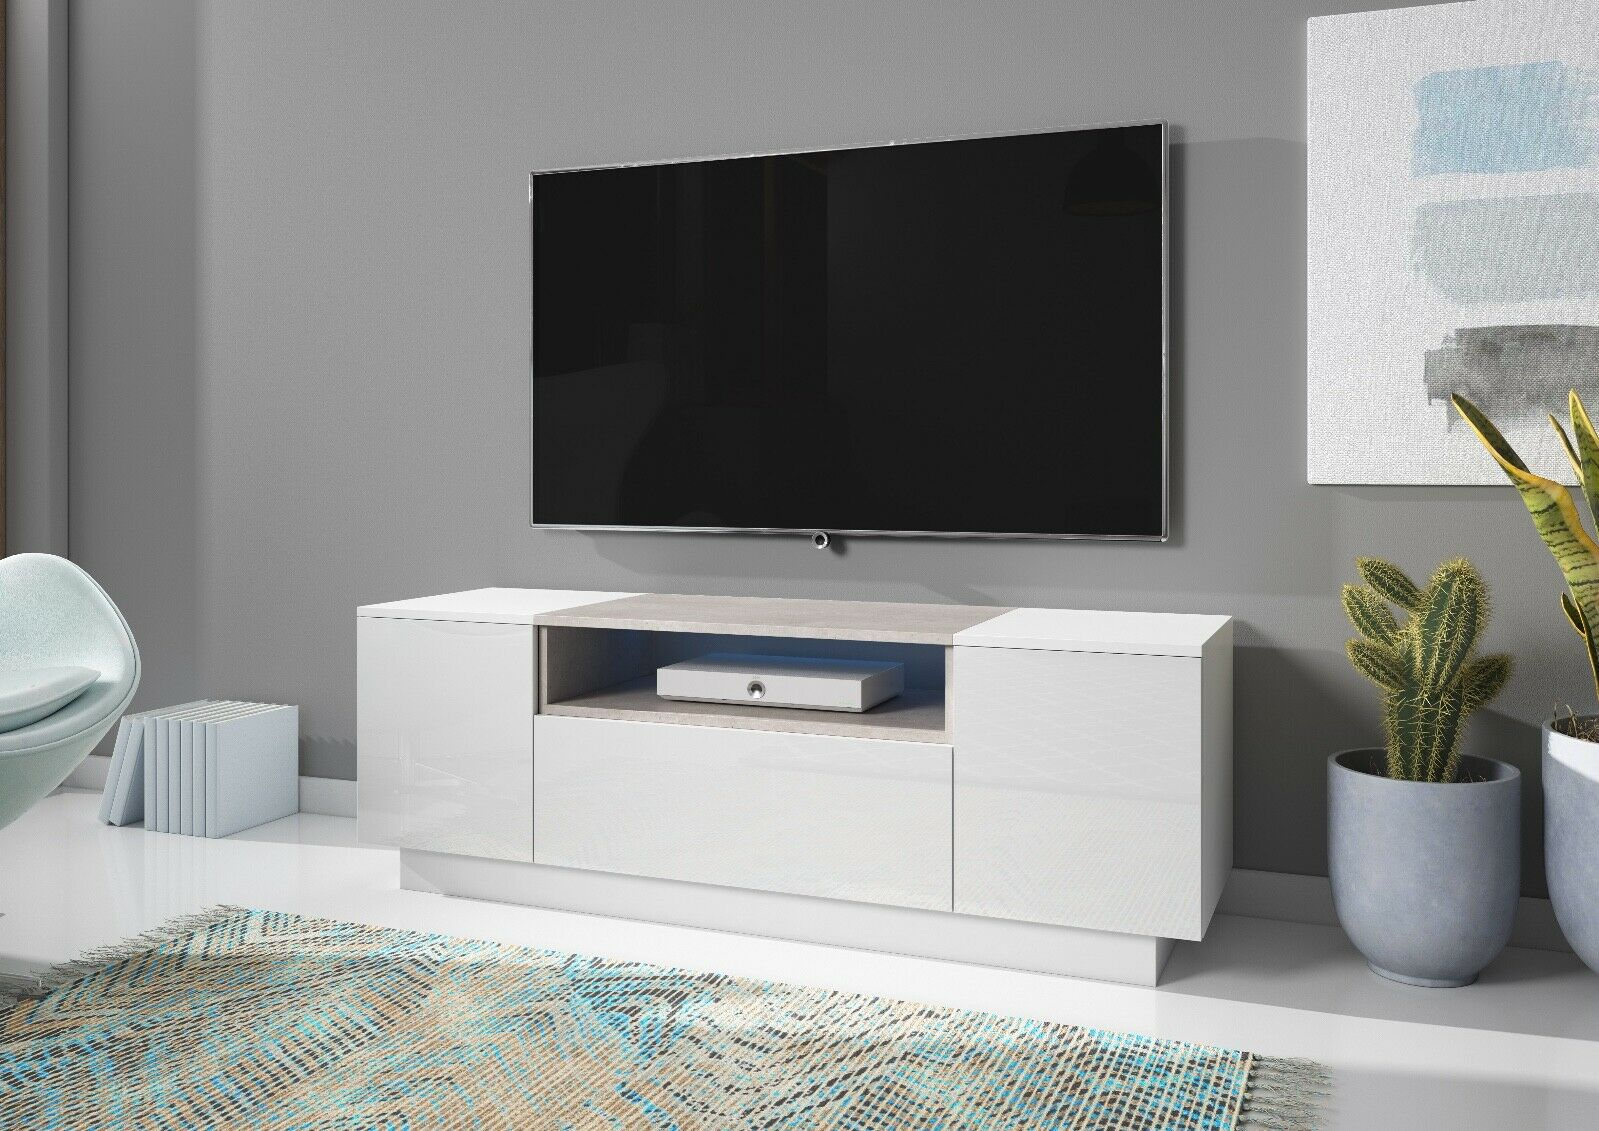 sideboard lowboard tv fernsehschrank rtv box 140 cm kommode inkl led highboard